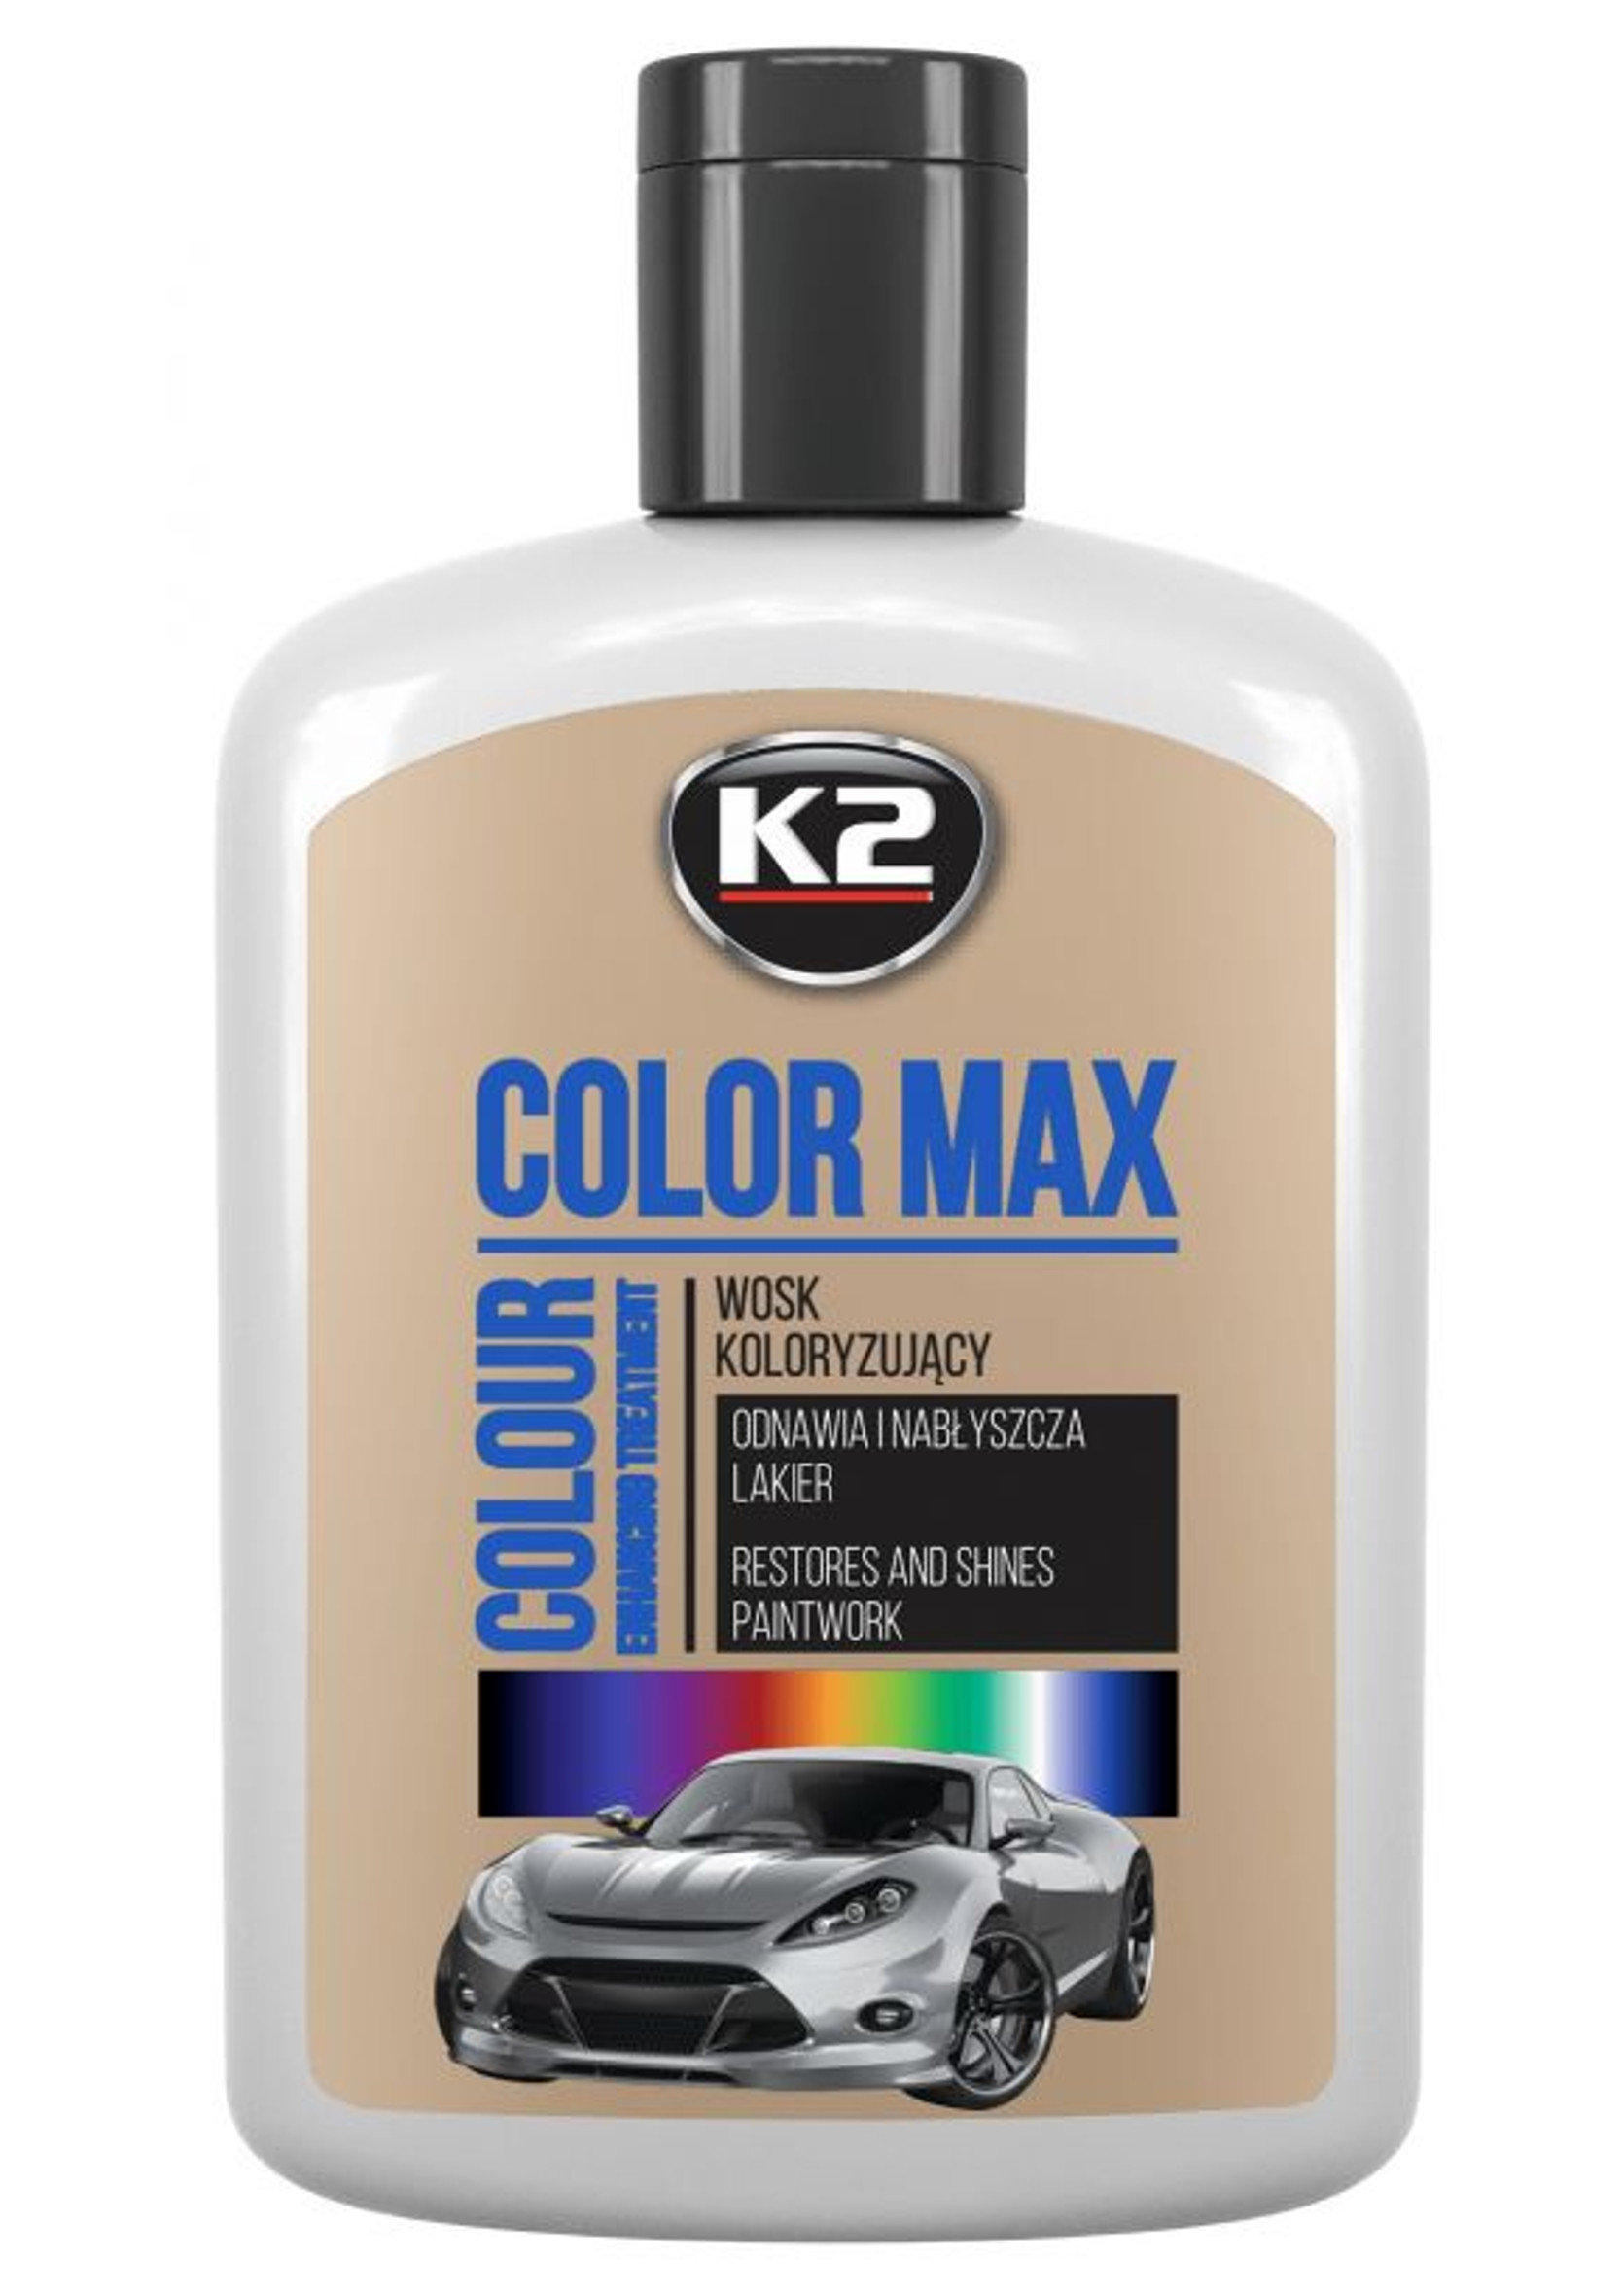 K2 Color Max 200ml Srebrny Wosk Koloryzujący do Lakieru